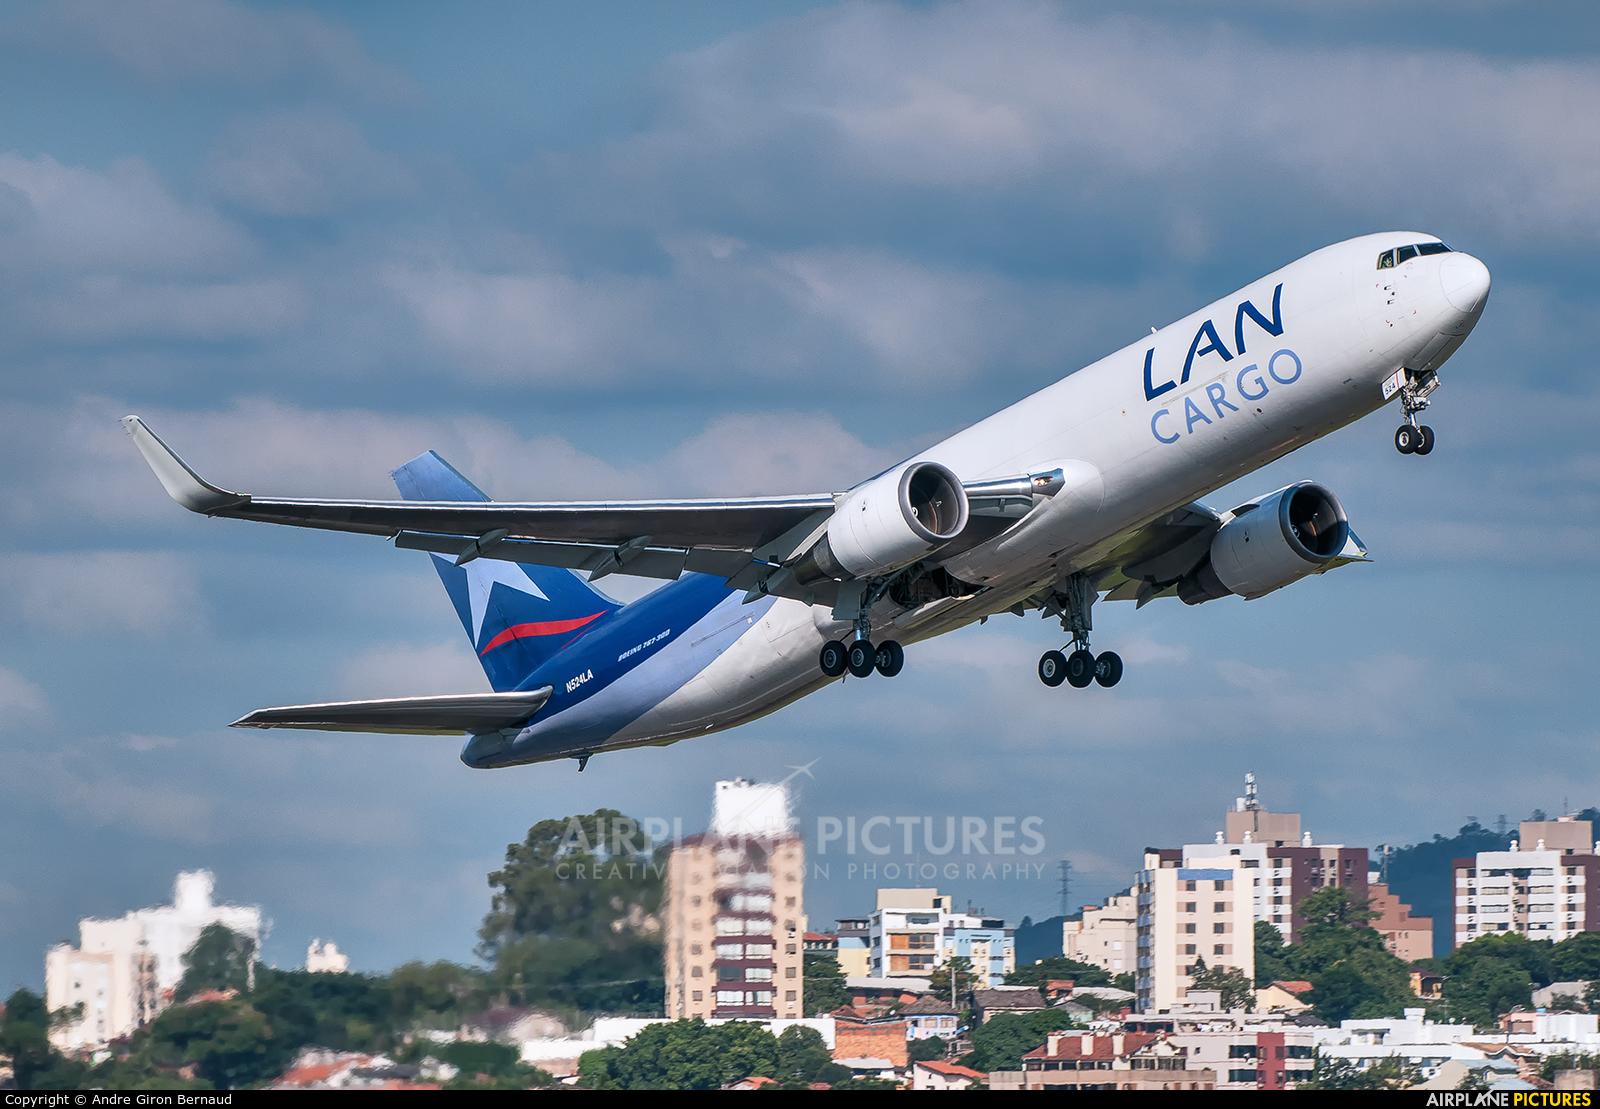 LAN Cargo N524LA aircraft at Porto Alegre - Salgado Filho